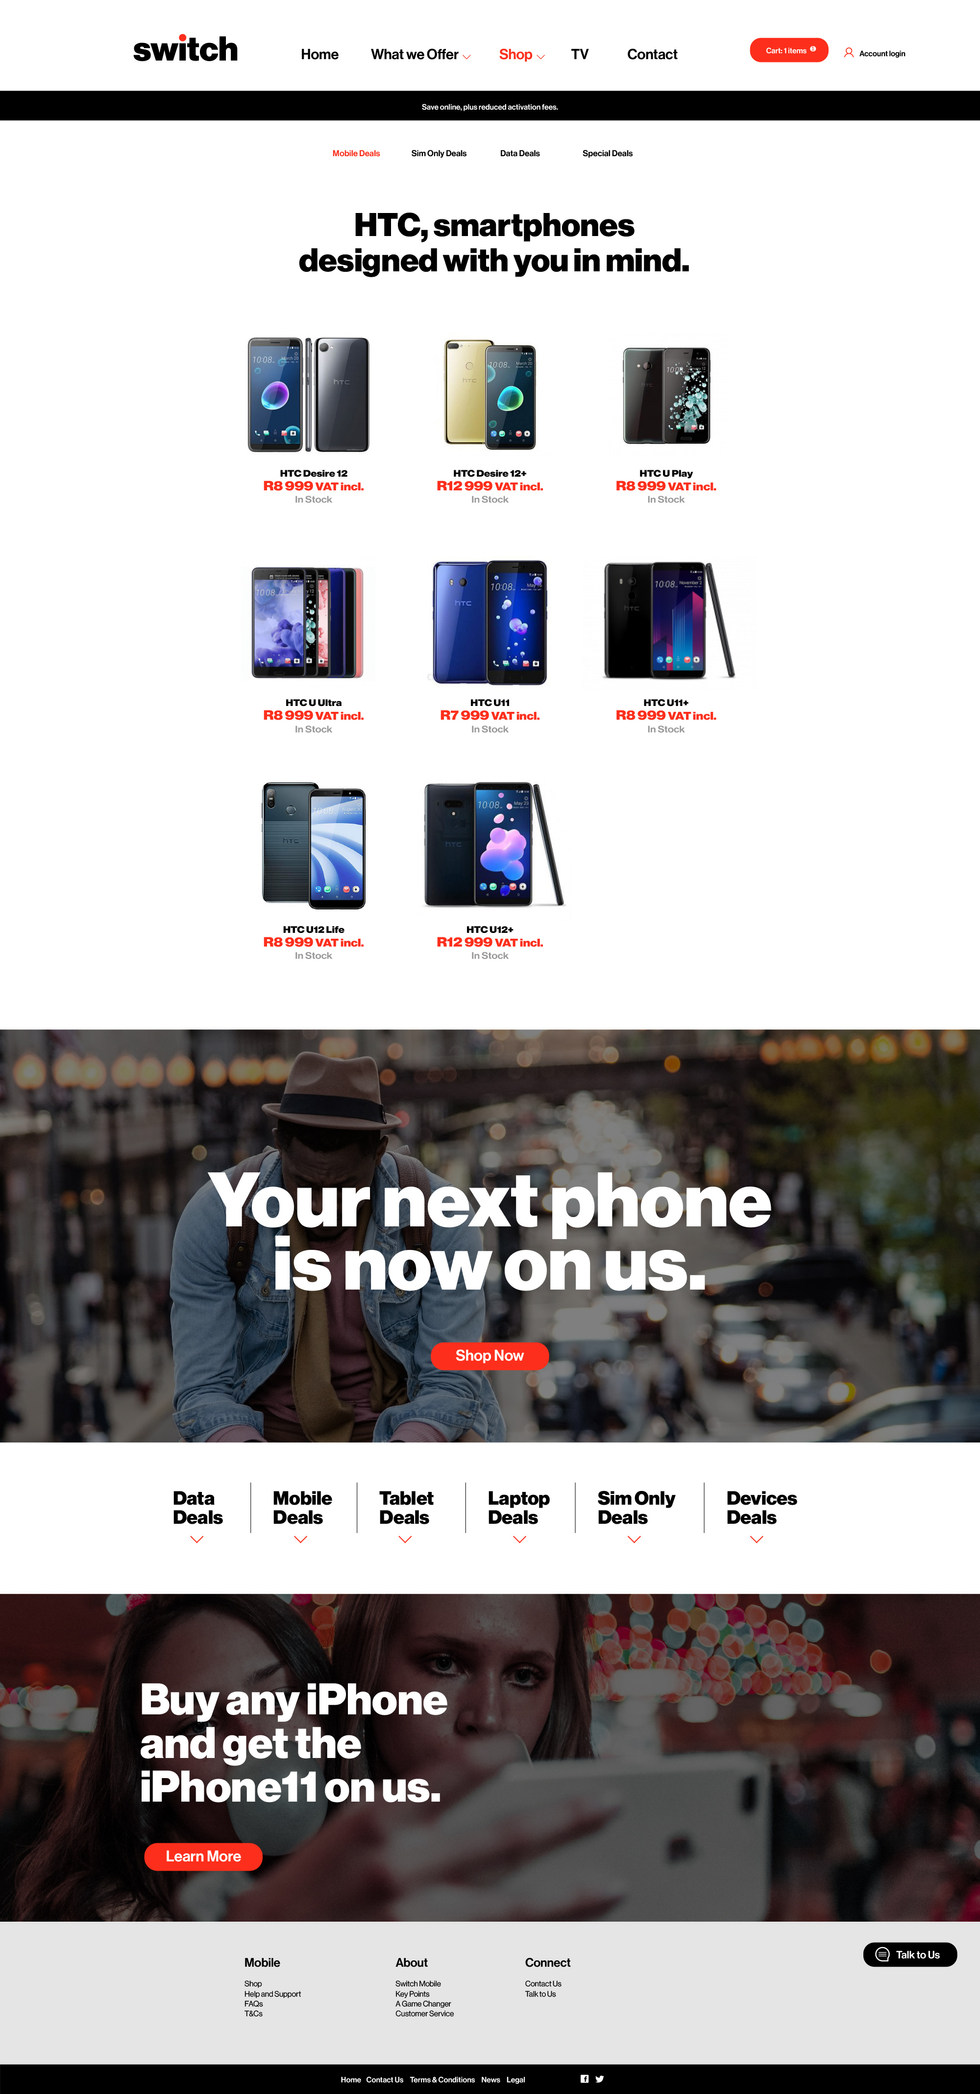 Switch-Mobile-Website-UI-UX20-3.jpg